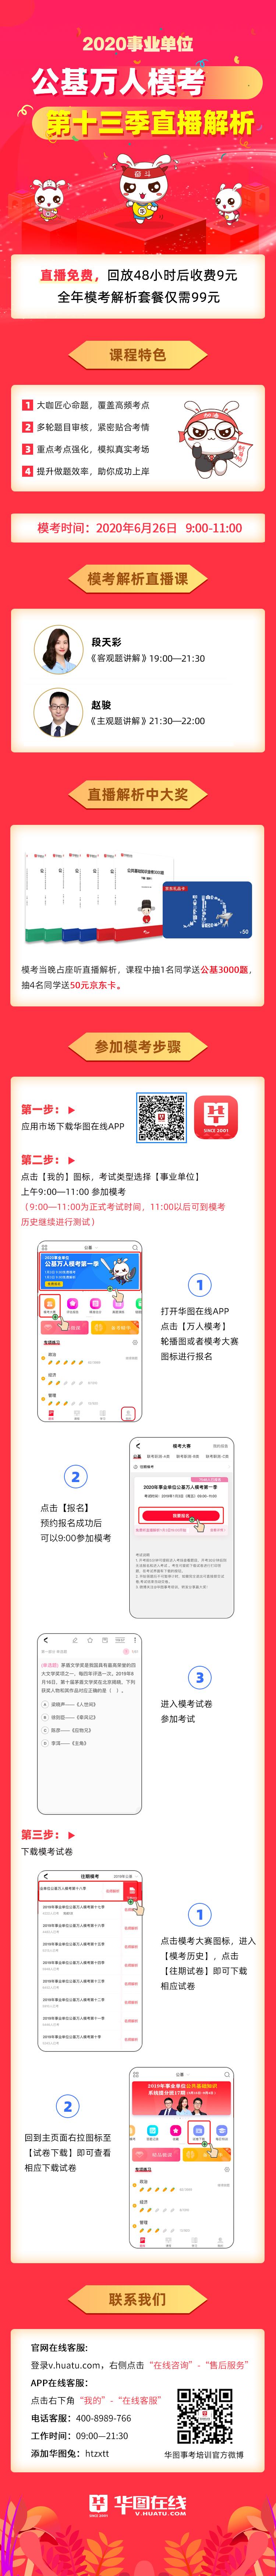 http://upload.htexam.com/userimg/1592794649.png